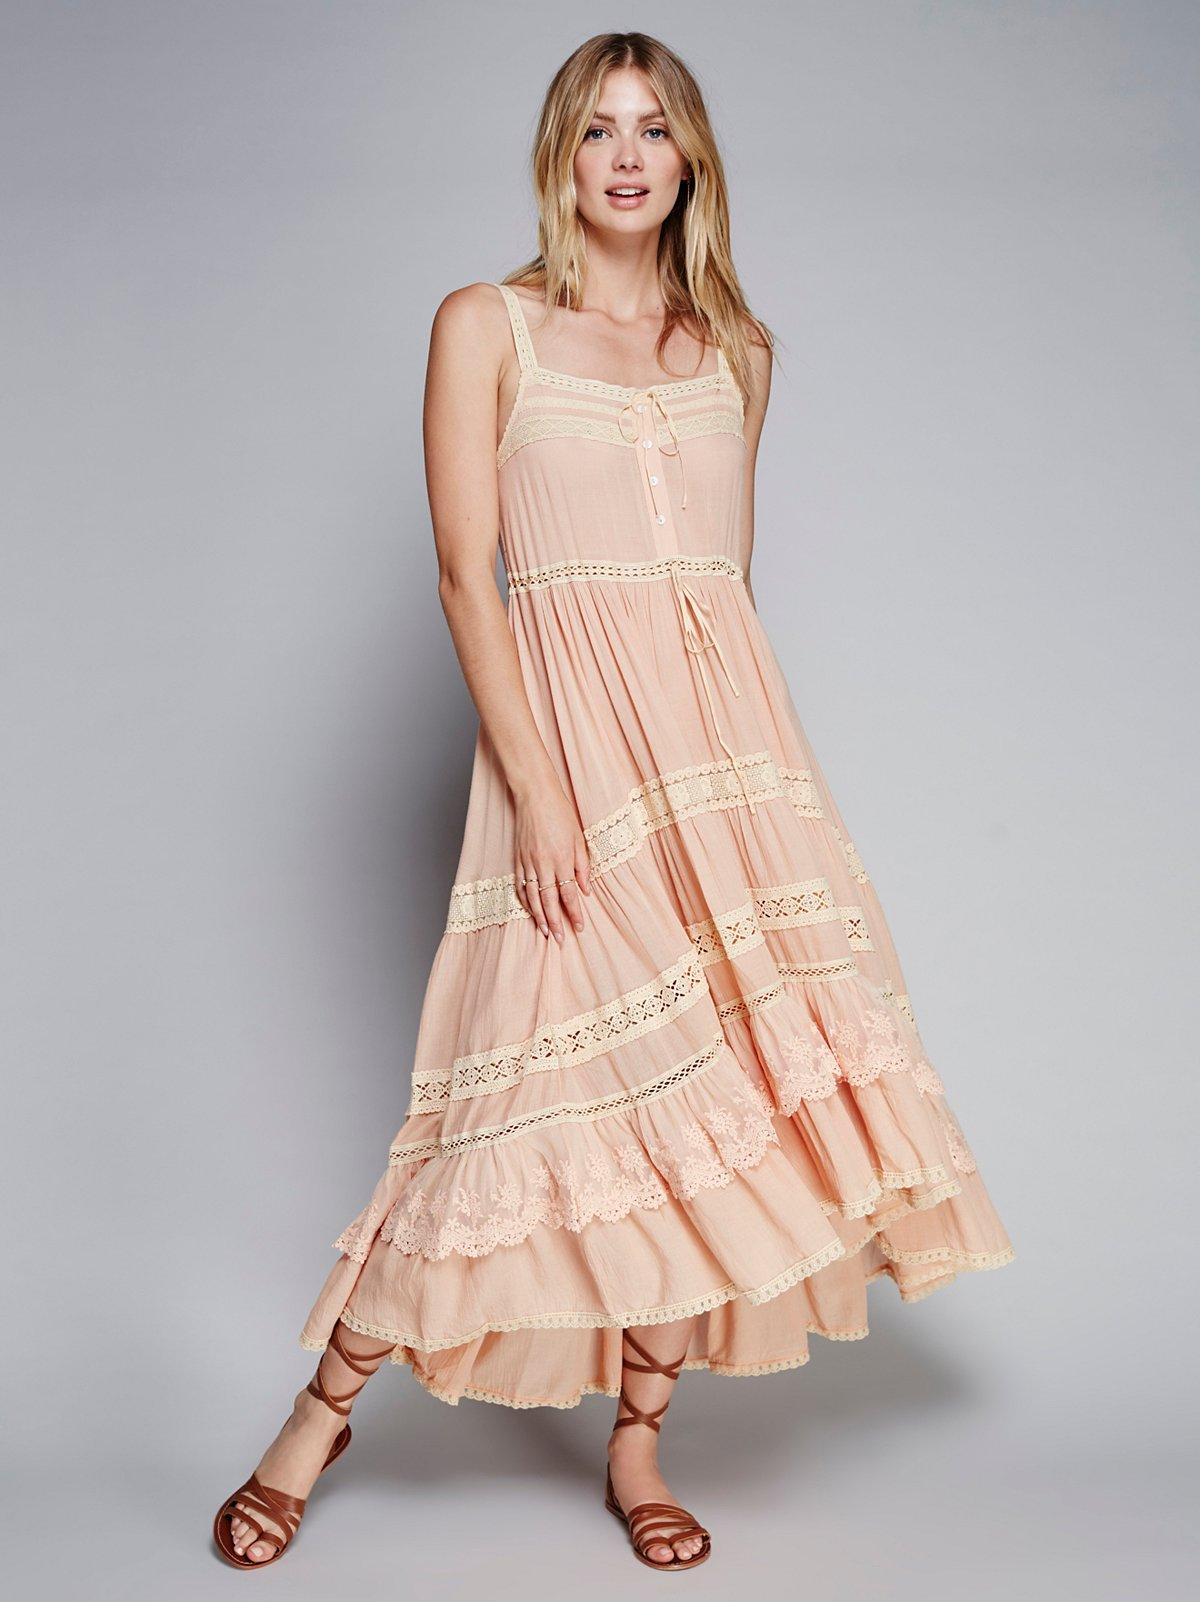 Rapunzel晚礼服